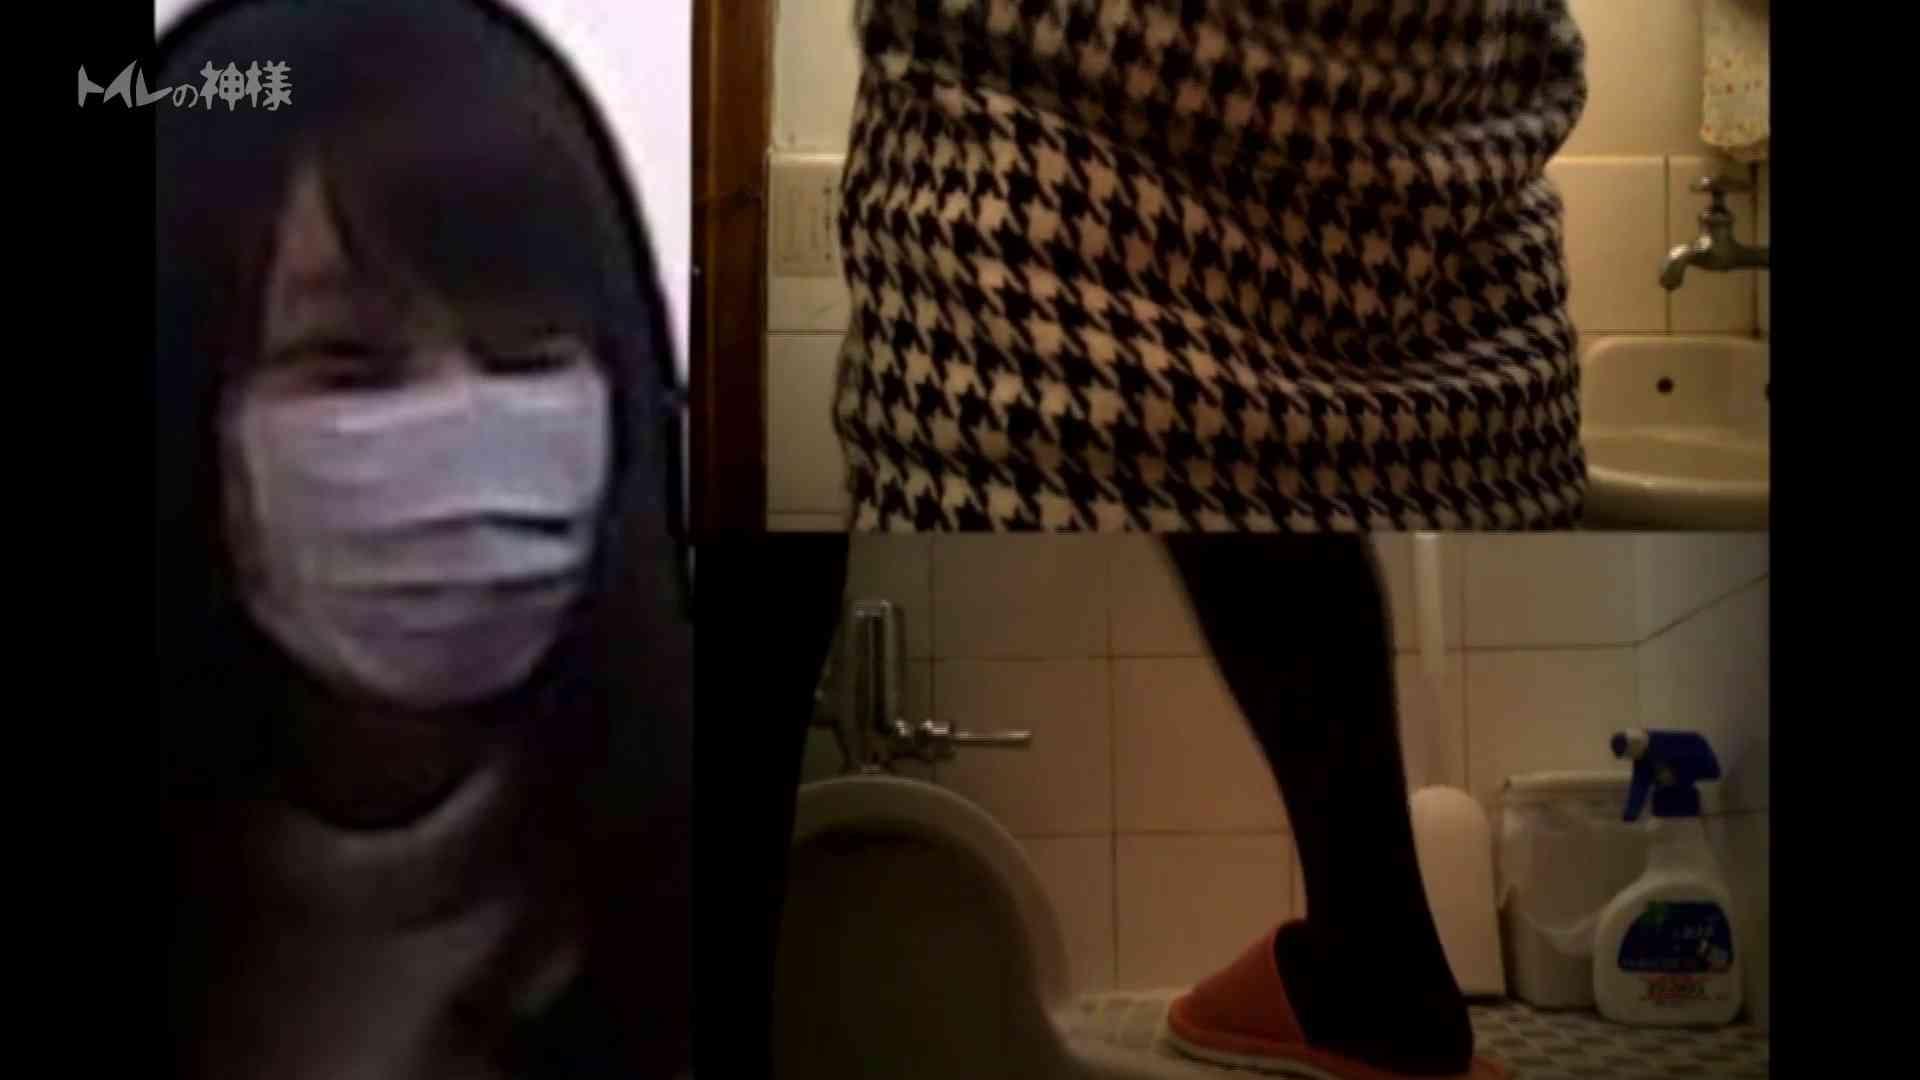 Vol.02 花の女子大生うんこ盗撮2 トイレ中 | 盗撮エロすぎ  34連発 9